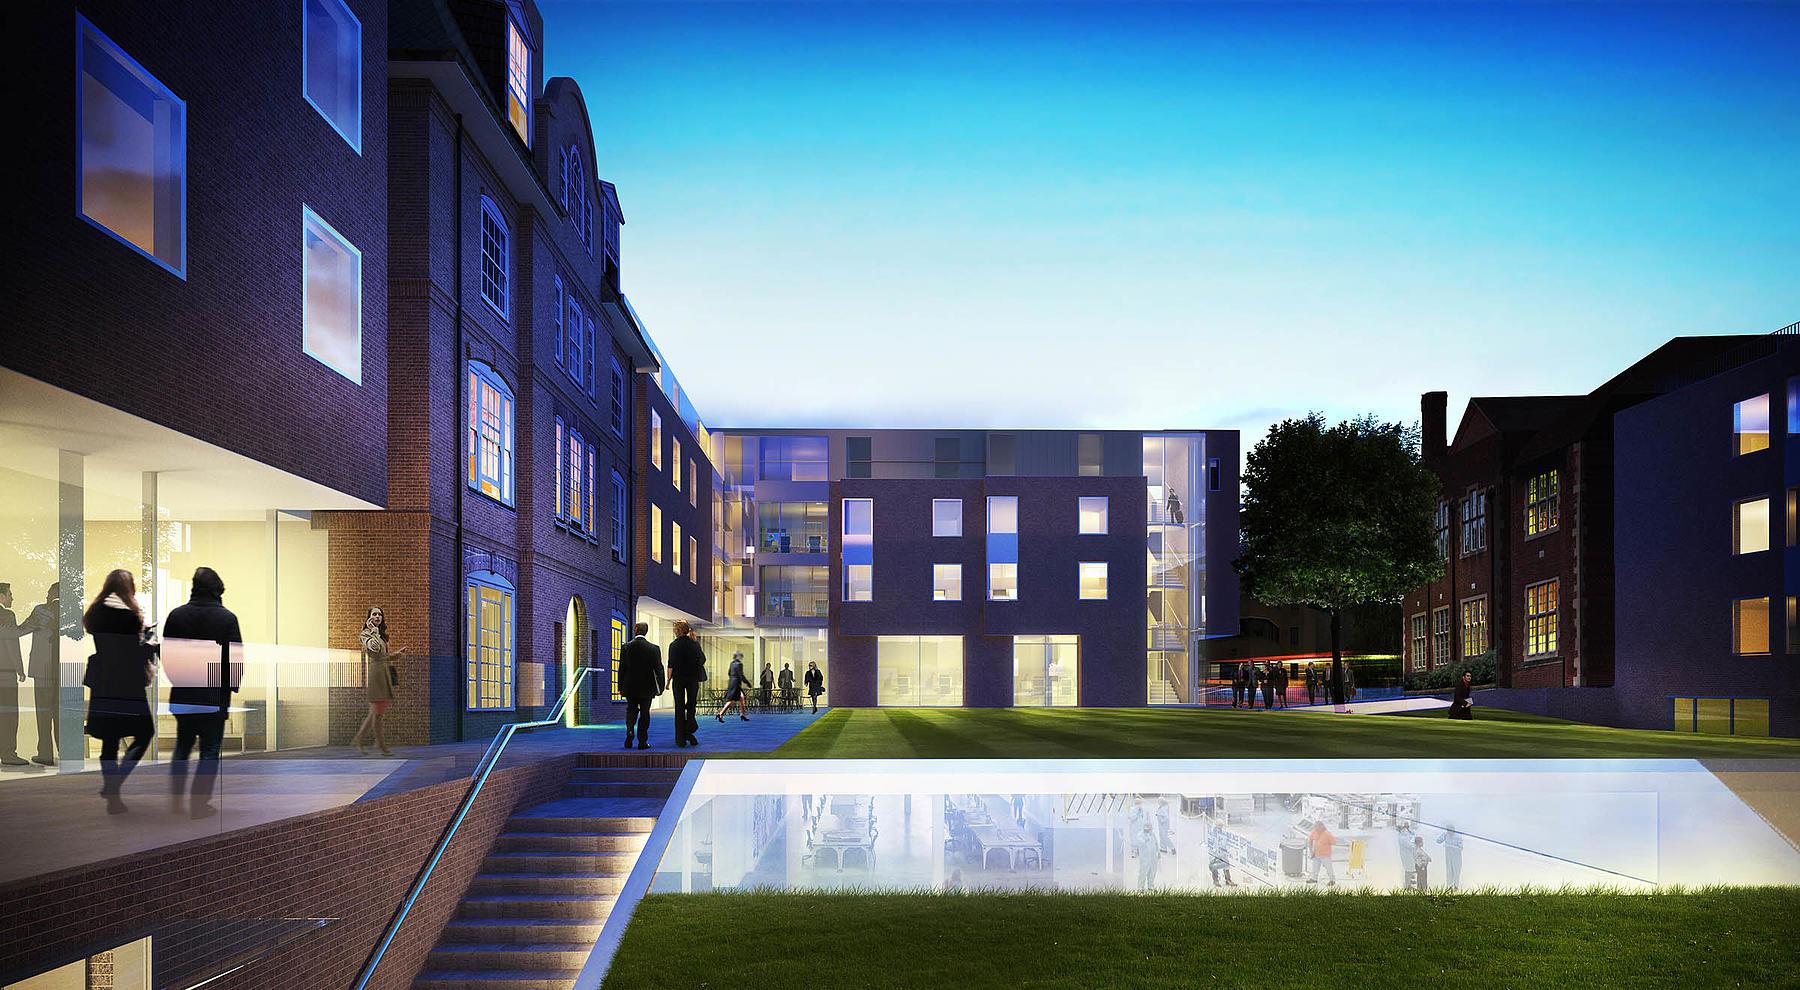 Maryland Institute College of Art - Wikipedia